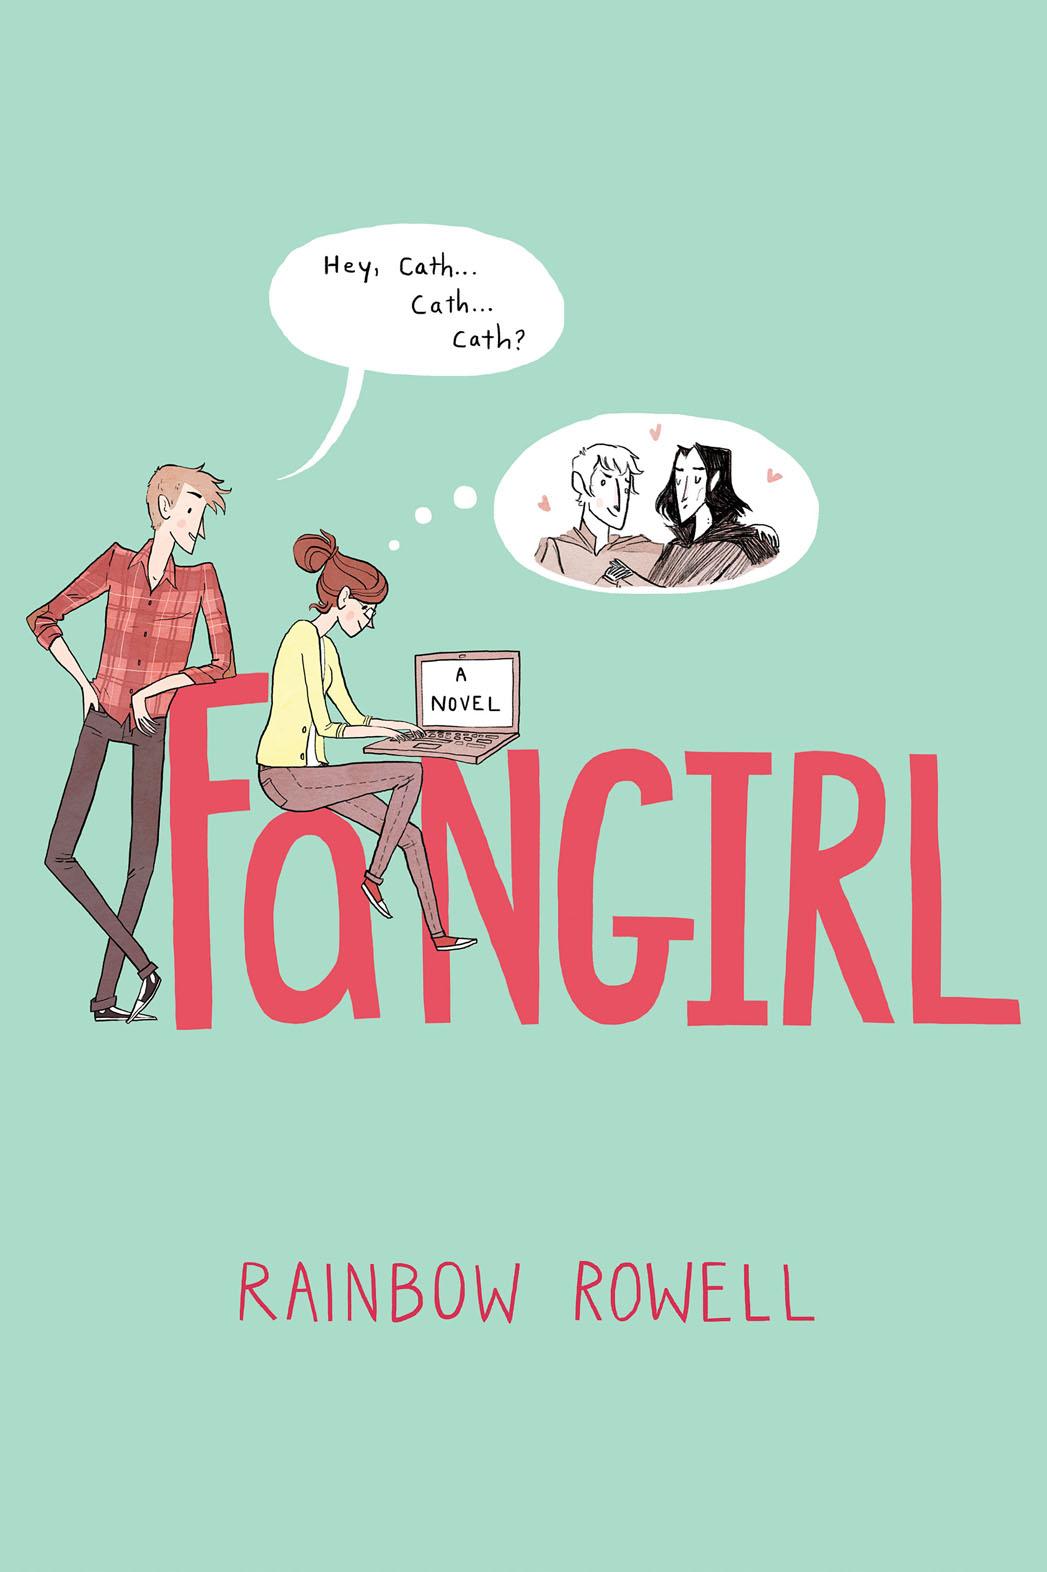 Fangirl Cover Art - P 2014